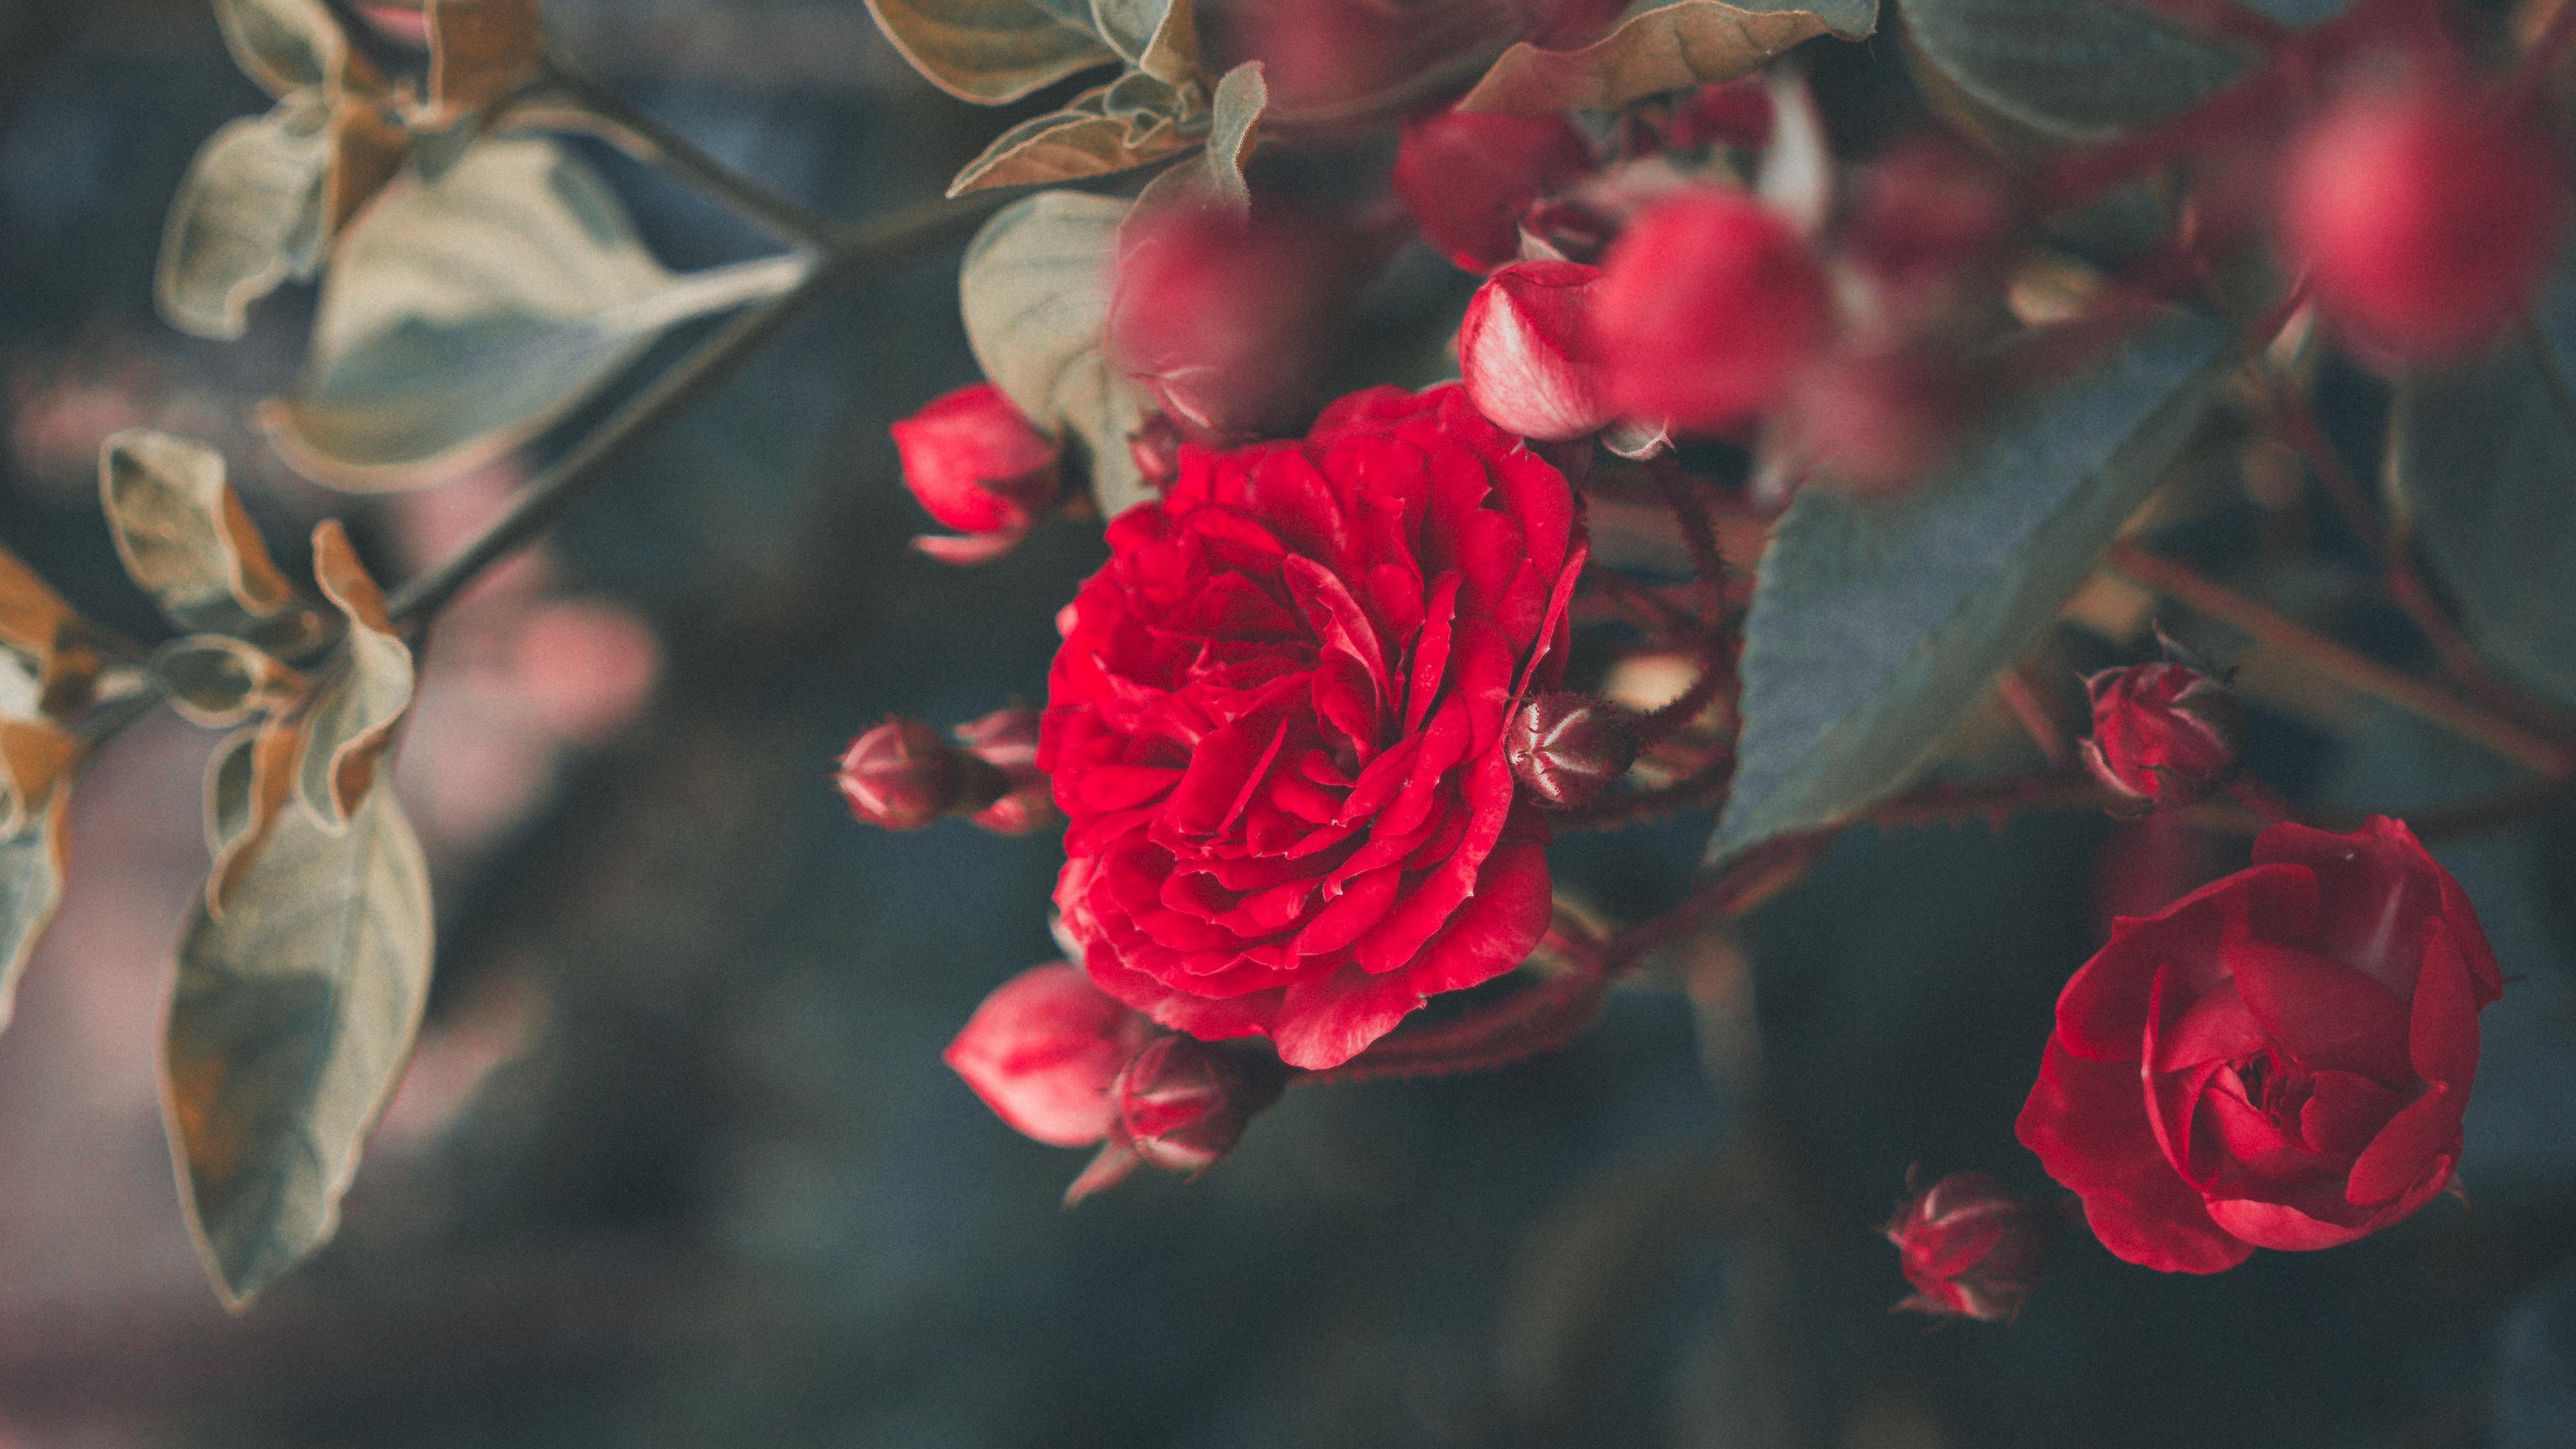 rose bush bloom garden red blur 4k 1540065163 - rose, bush, bloom, garden, red, blur 4k - Rose, Bush, Bloom